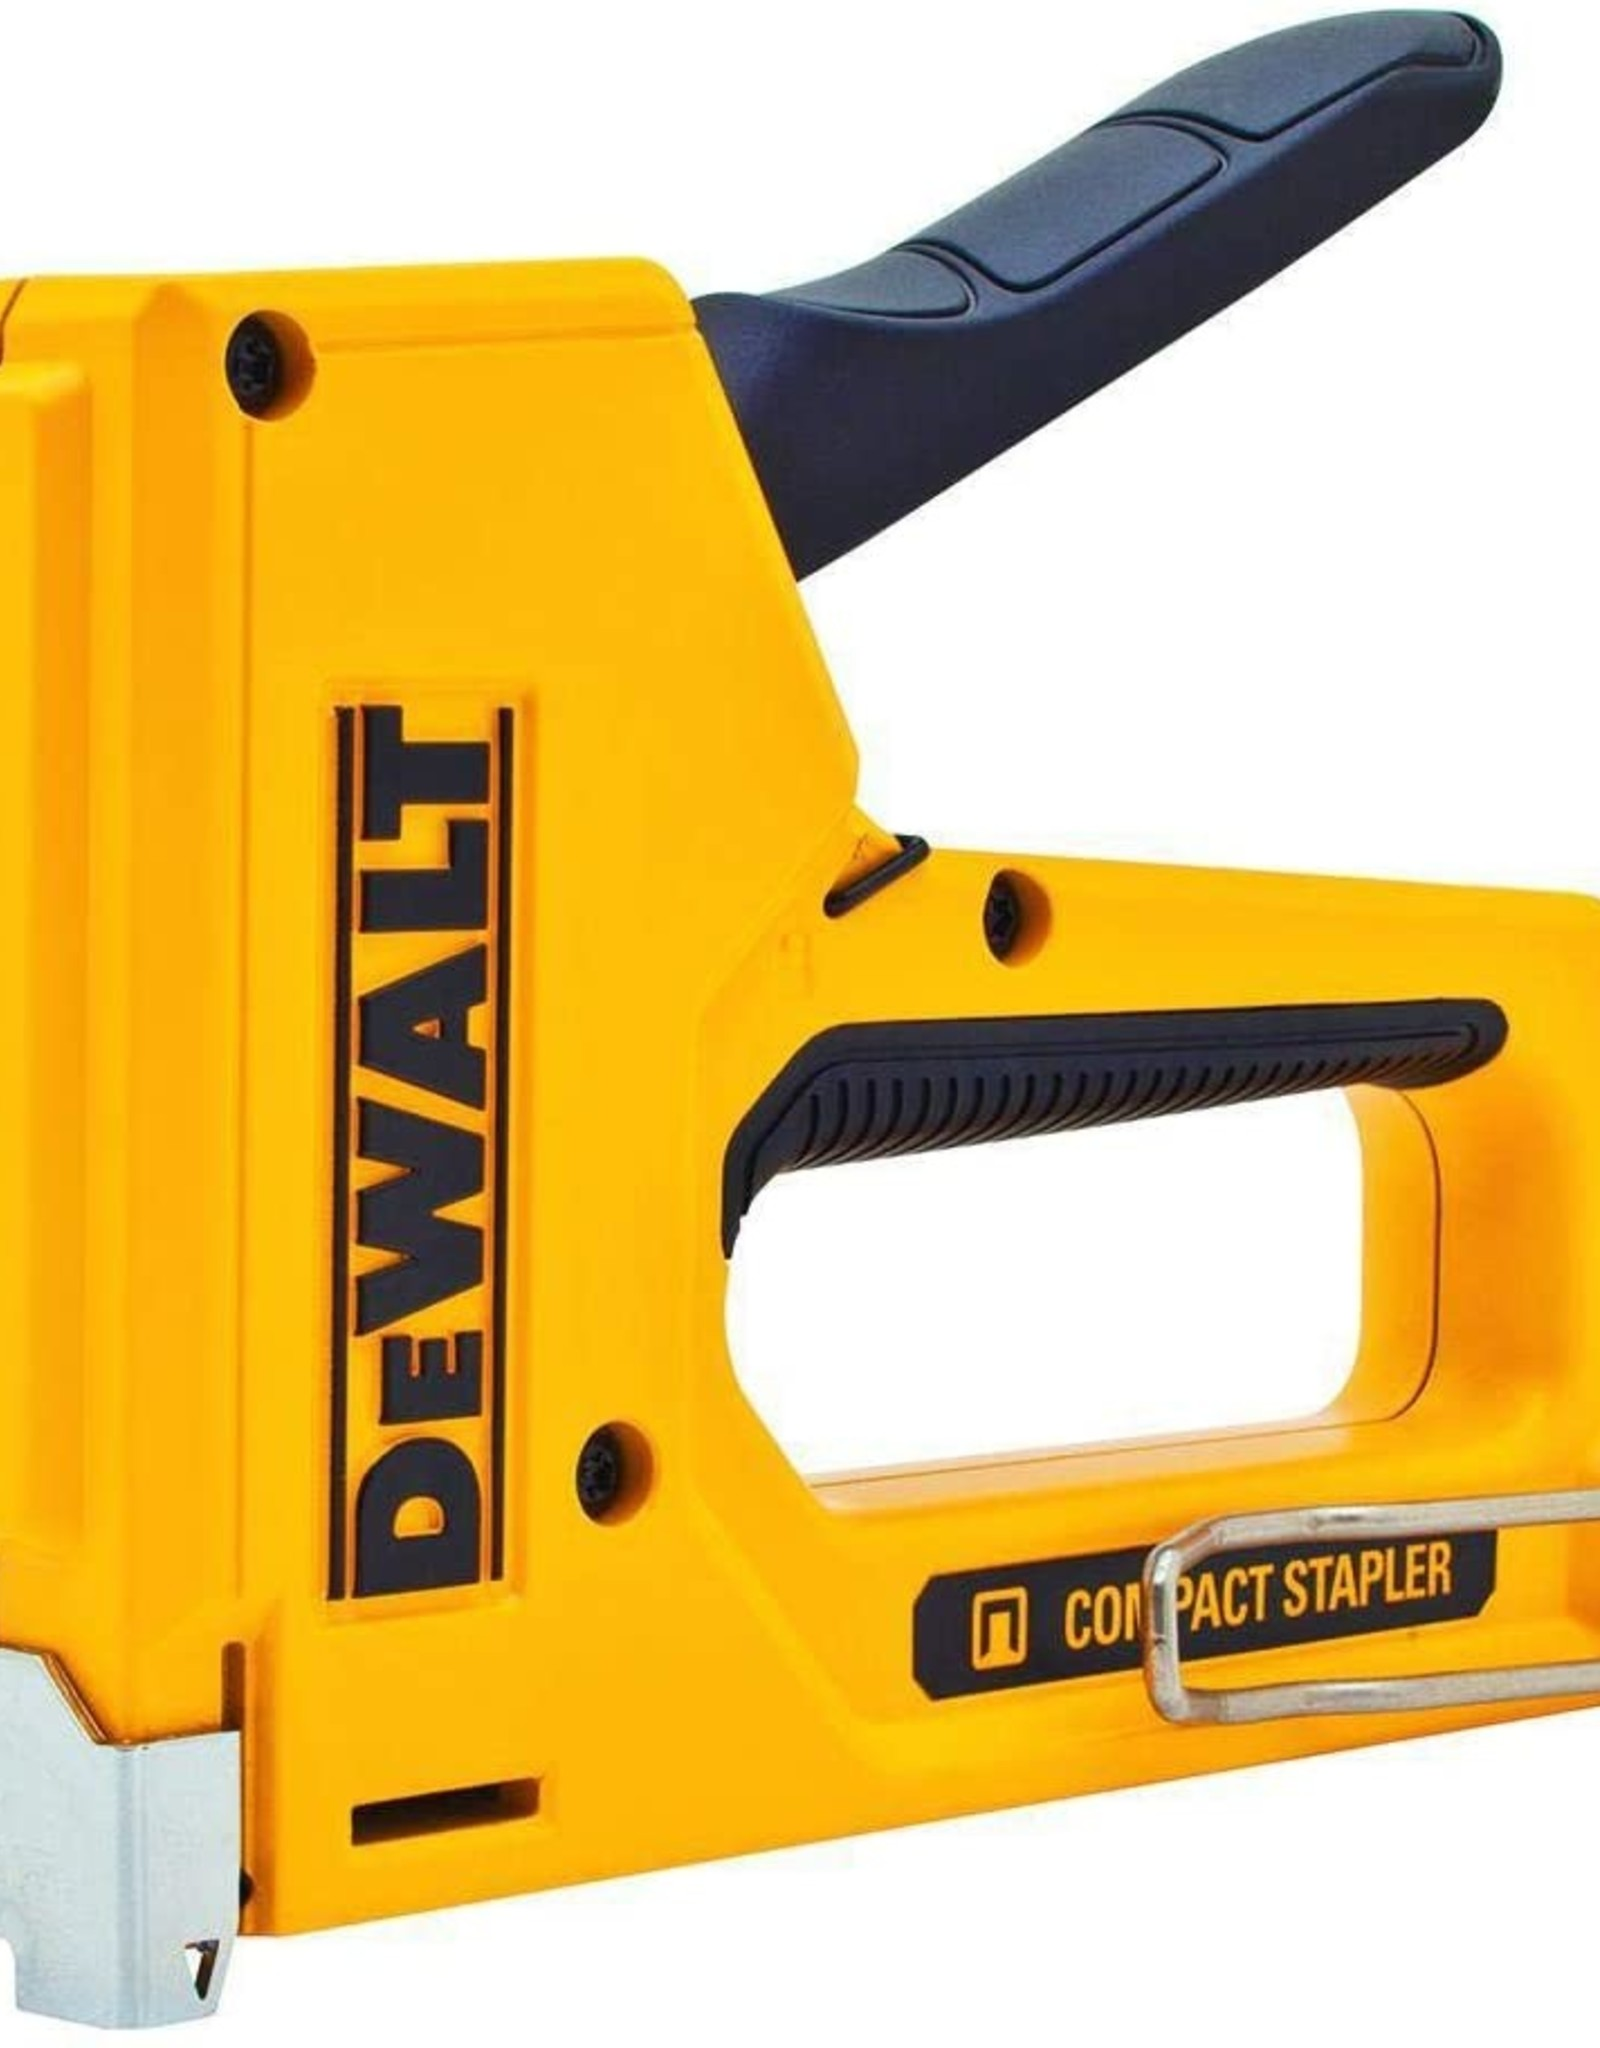 Dewalt Staple Gun, Manual, Heavy Duty, Narrow Crwn.